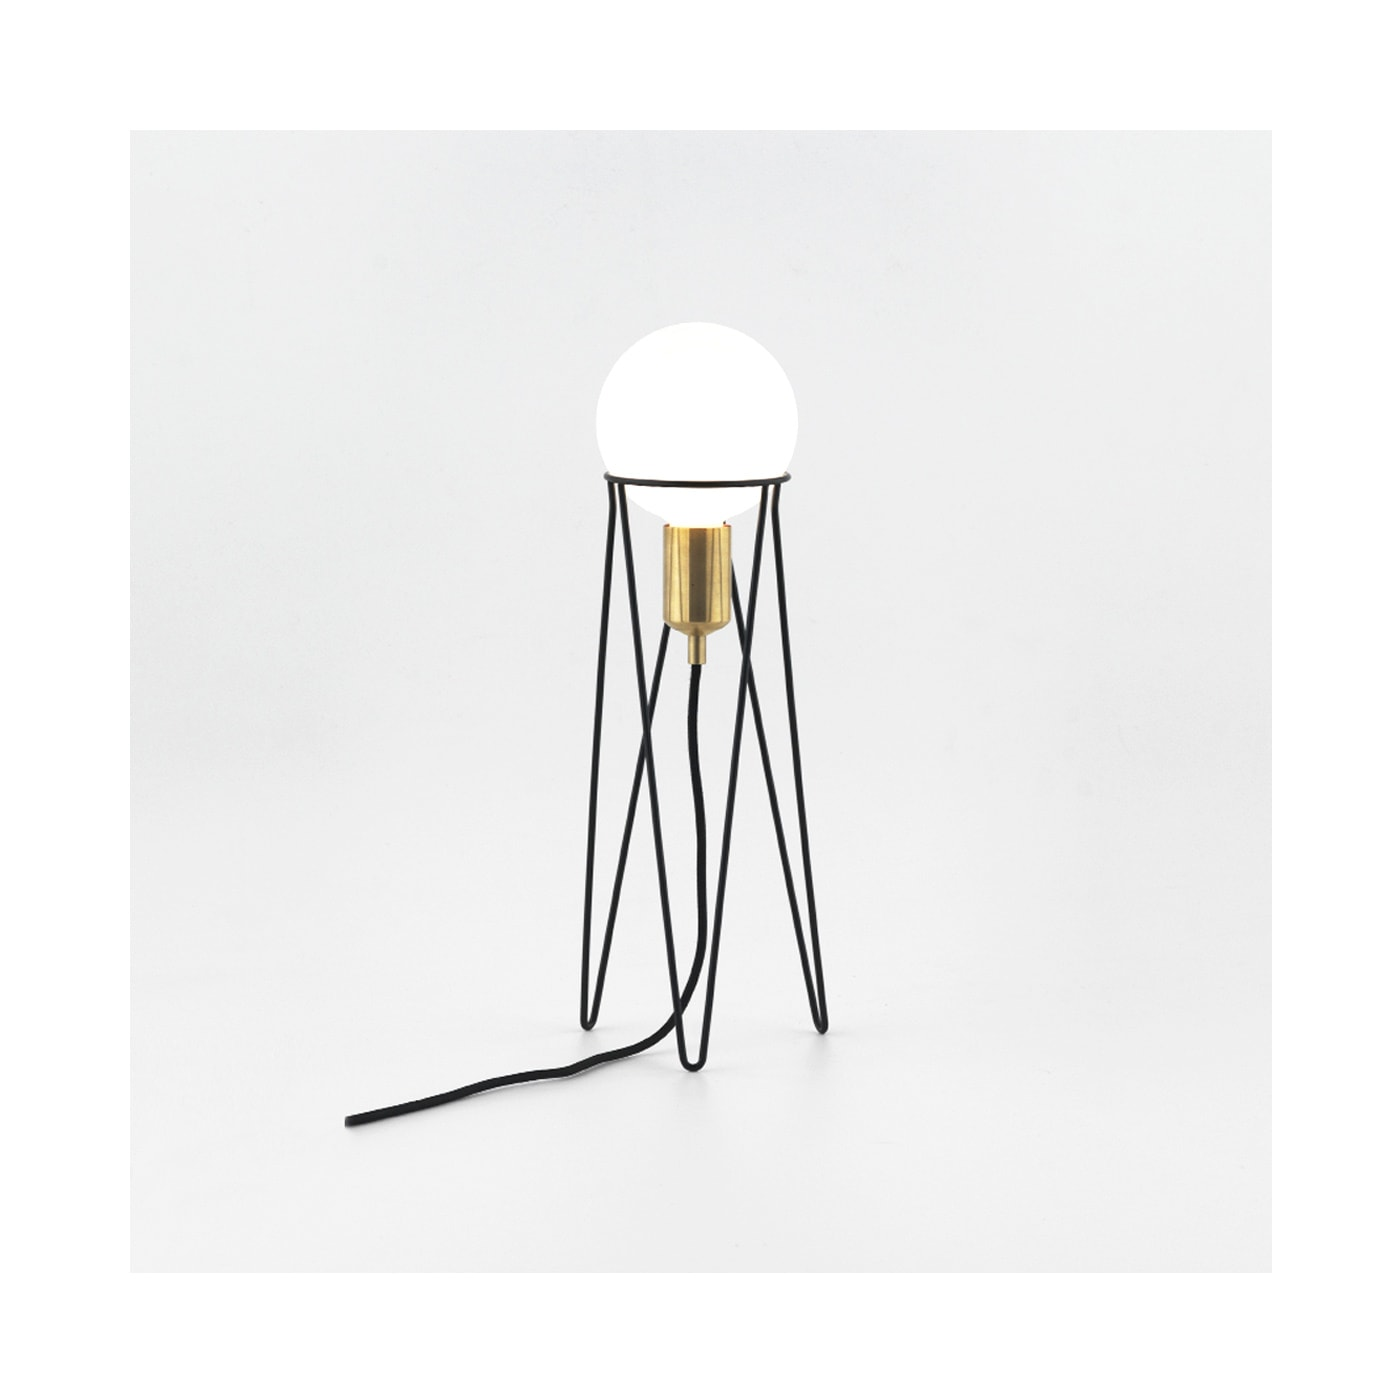 Aromas-Ippot-lampada-tavolo-vendita-online